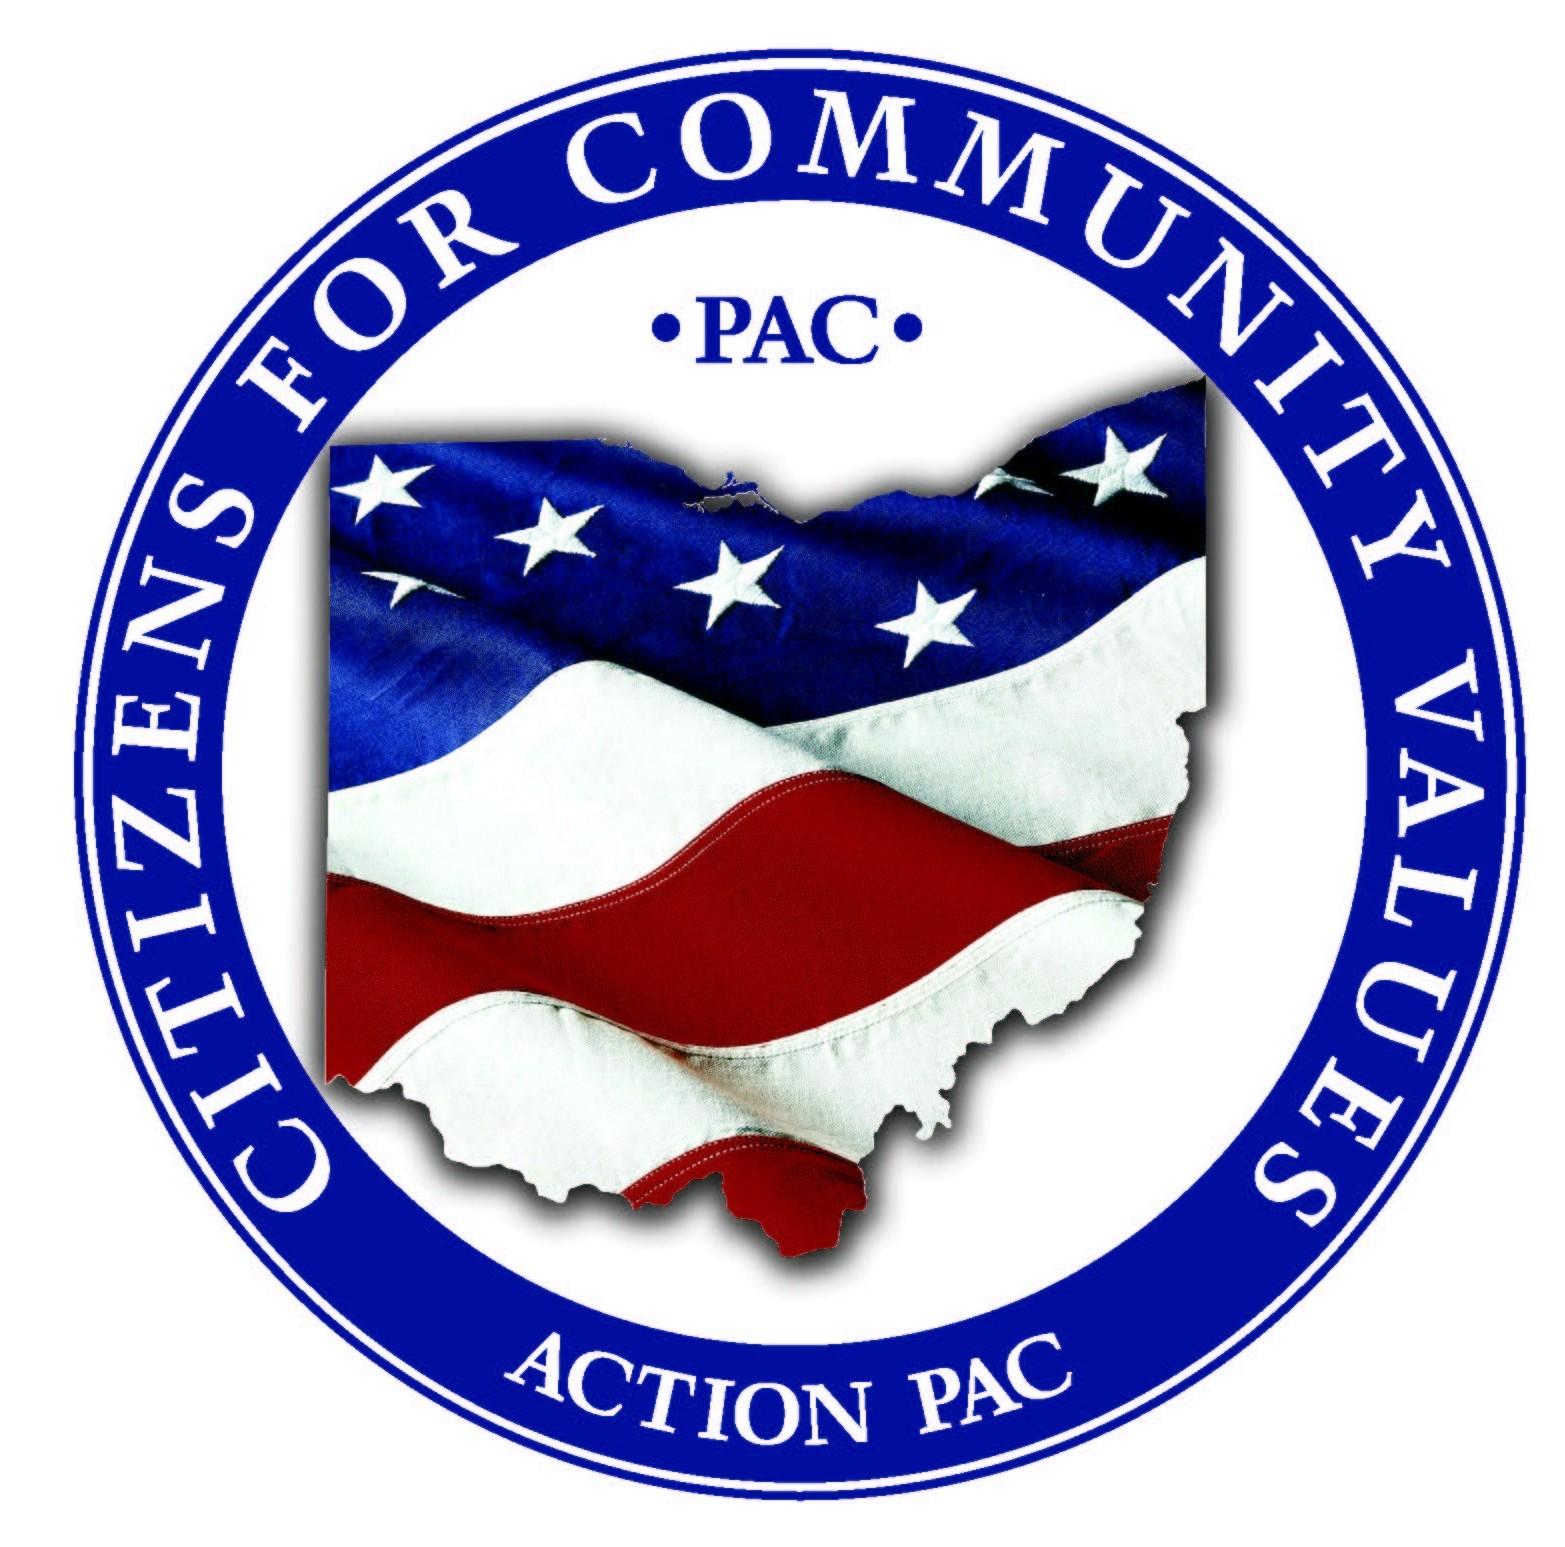 CCV_Action_PAC_Logo.jpg